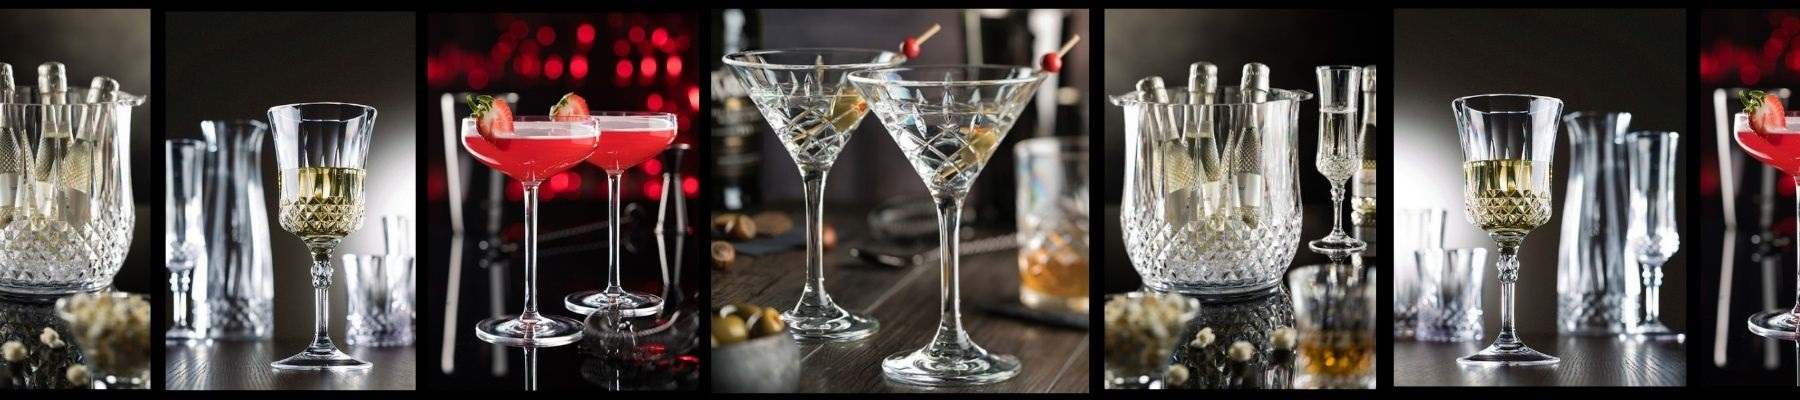 Utopia Plastic Martini Glasses and cocktail glasses from Glassjacks